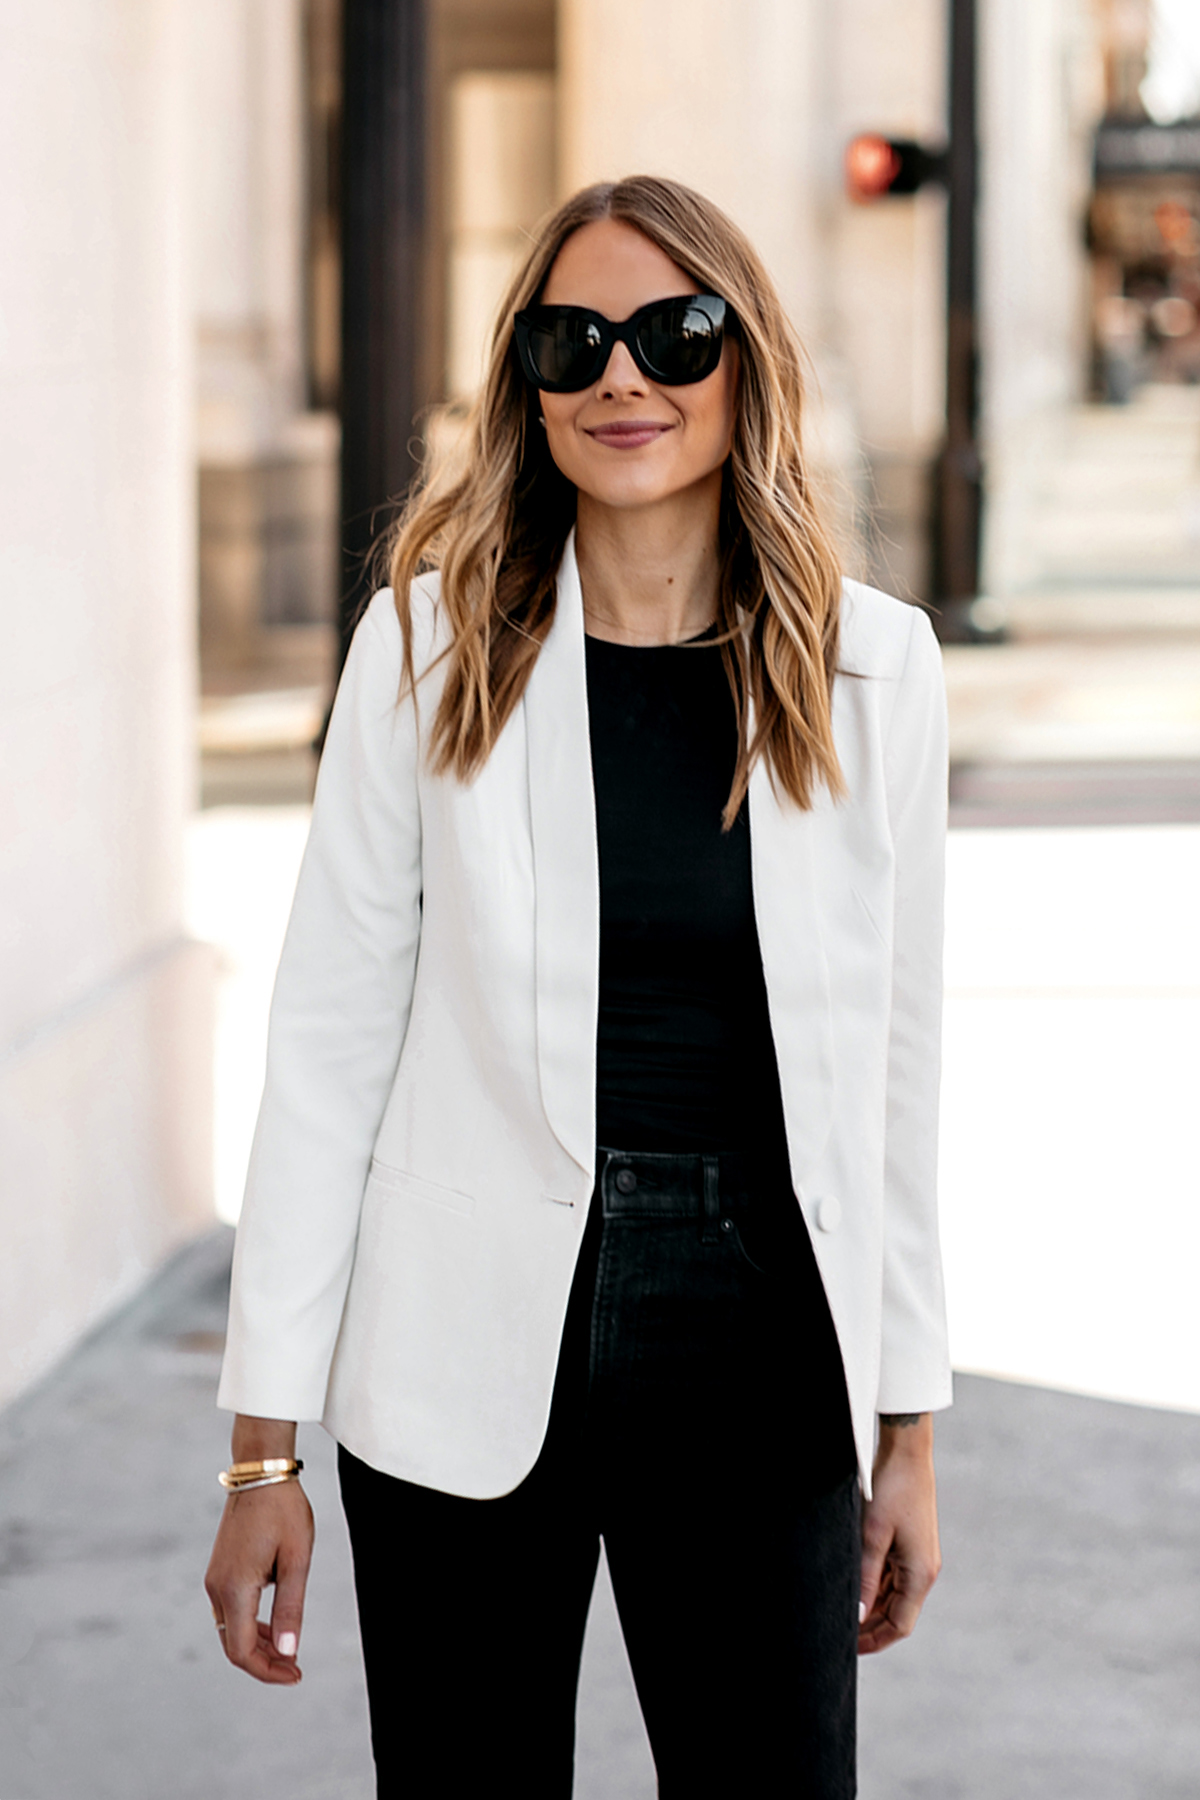 Fashion Jackson Wearing Express White Blazer Black Bodysuit Black Jeans Modern Workwear Outfit